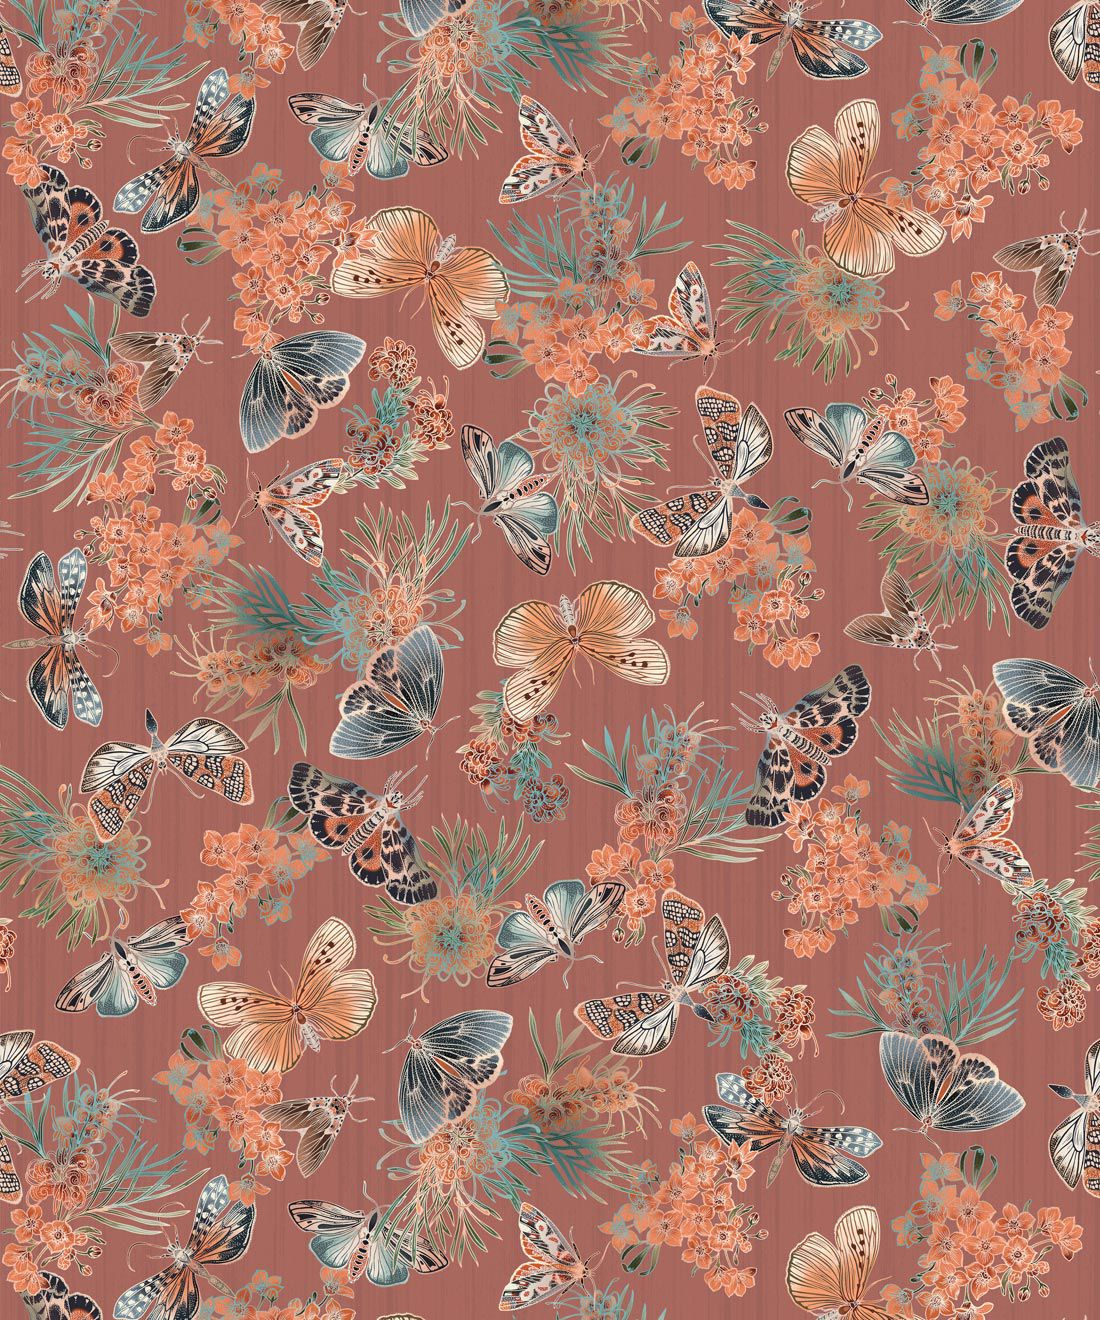 Moth Wallpaper • Eloise Short • Vintage Floral Wallpaper •Granny Chic Wallpaper • Grandmillennial Style Wallpaper •Rosewood •Swatch